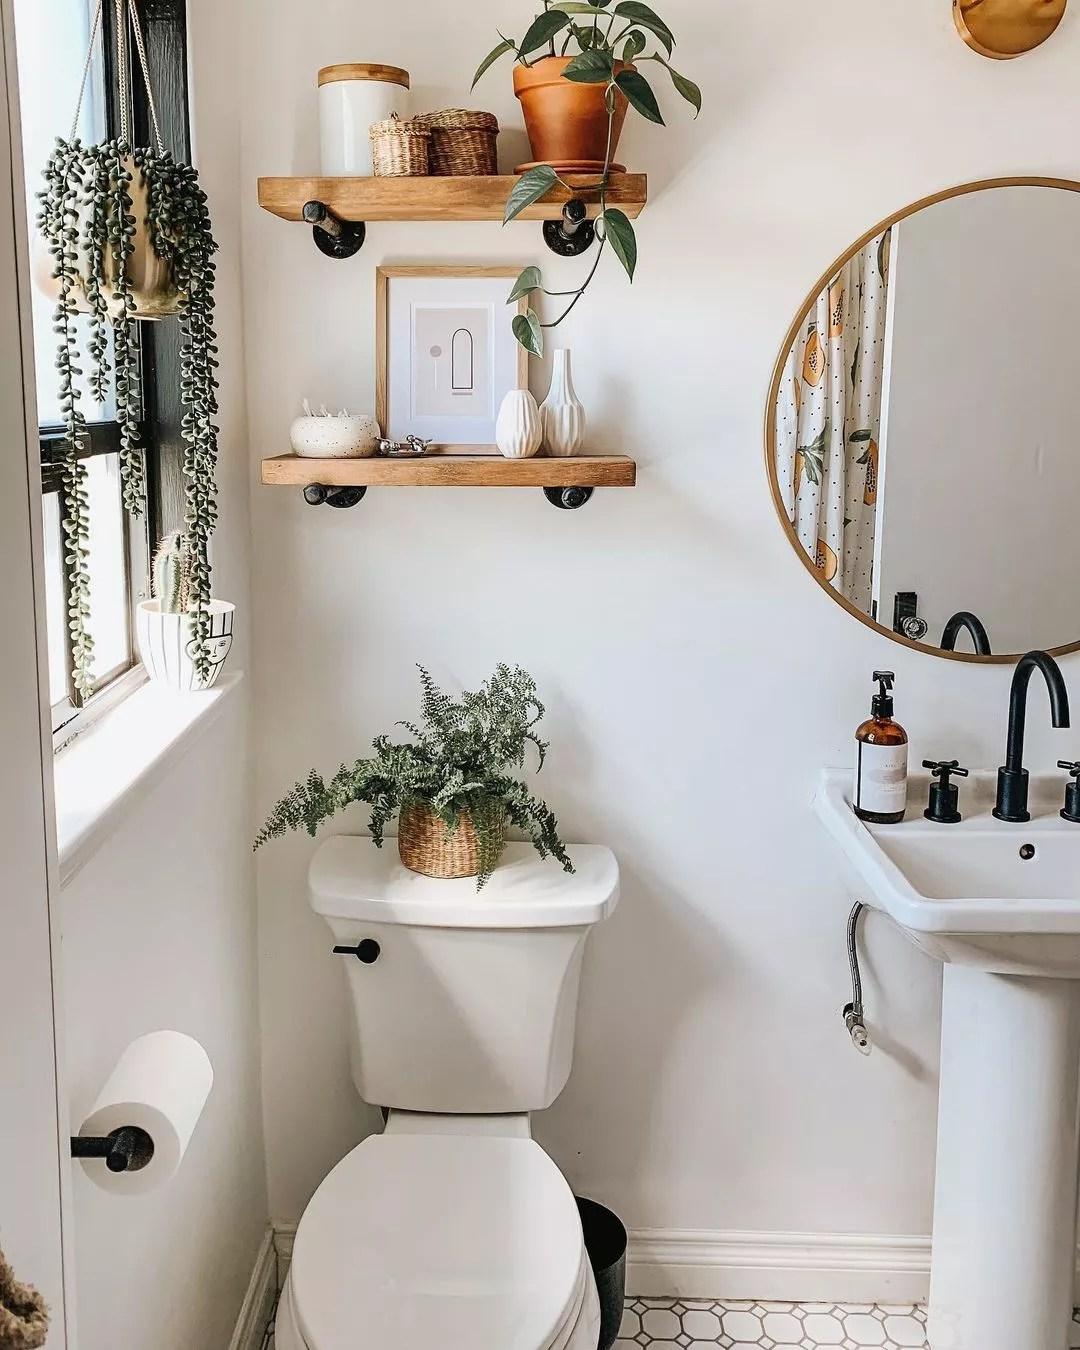 White bathroom with plants. Photo by Instagram user @ cloe.thomson